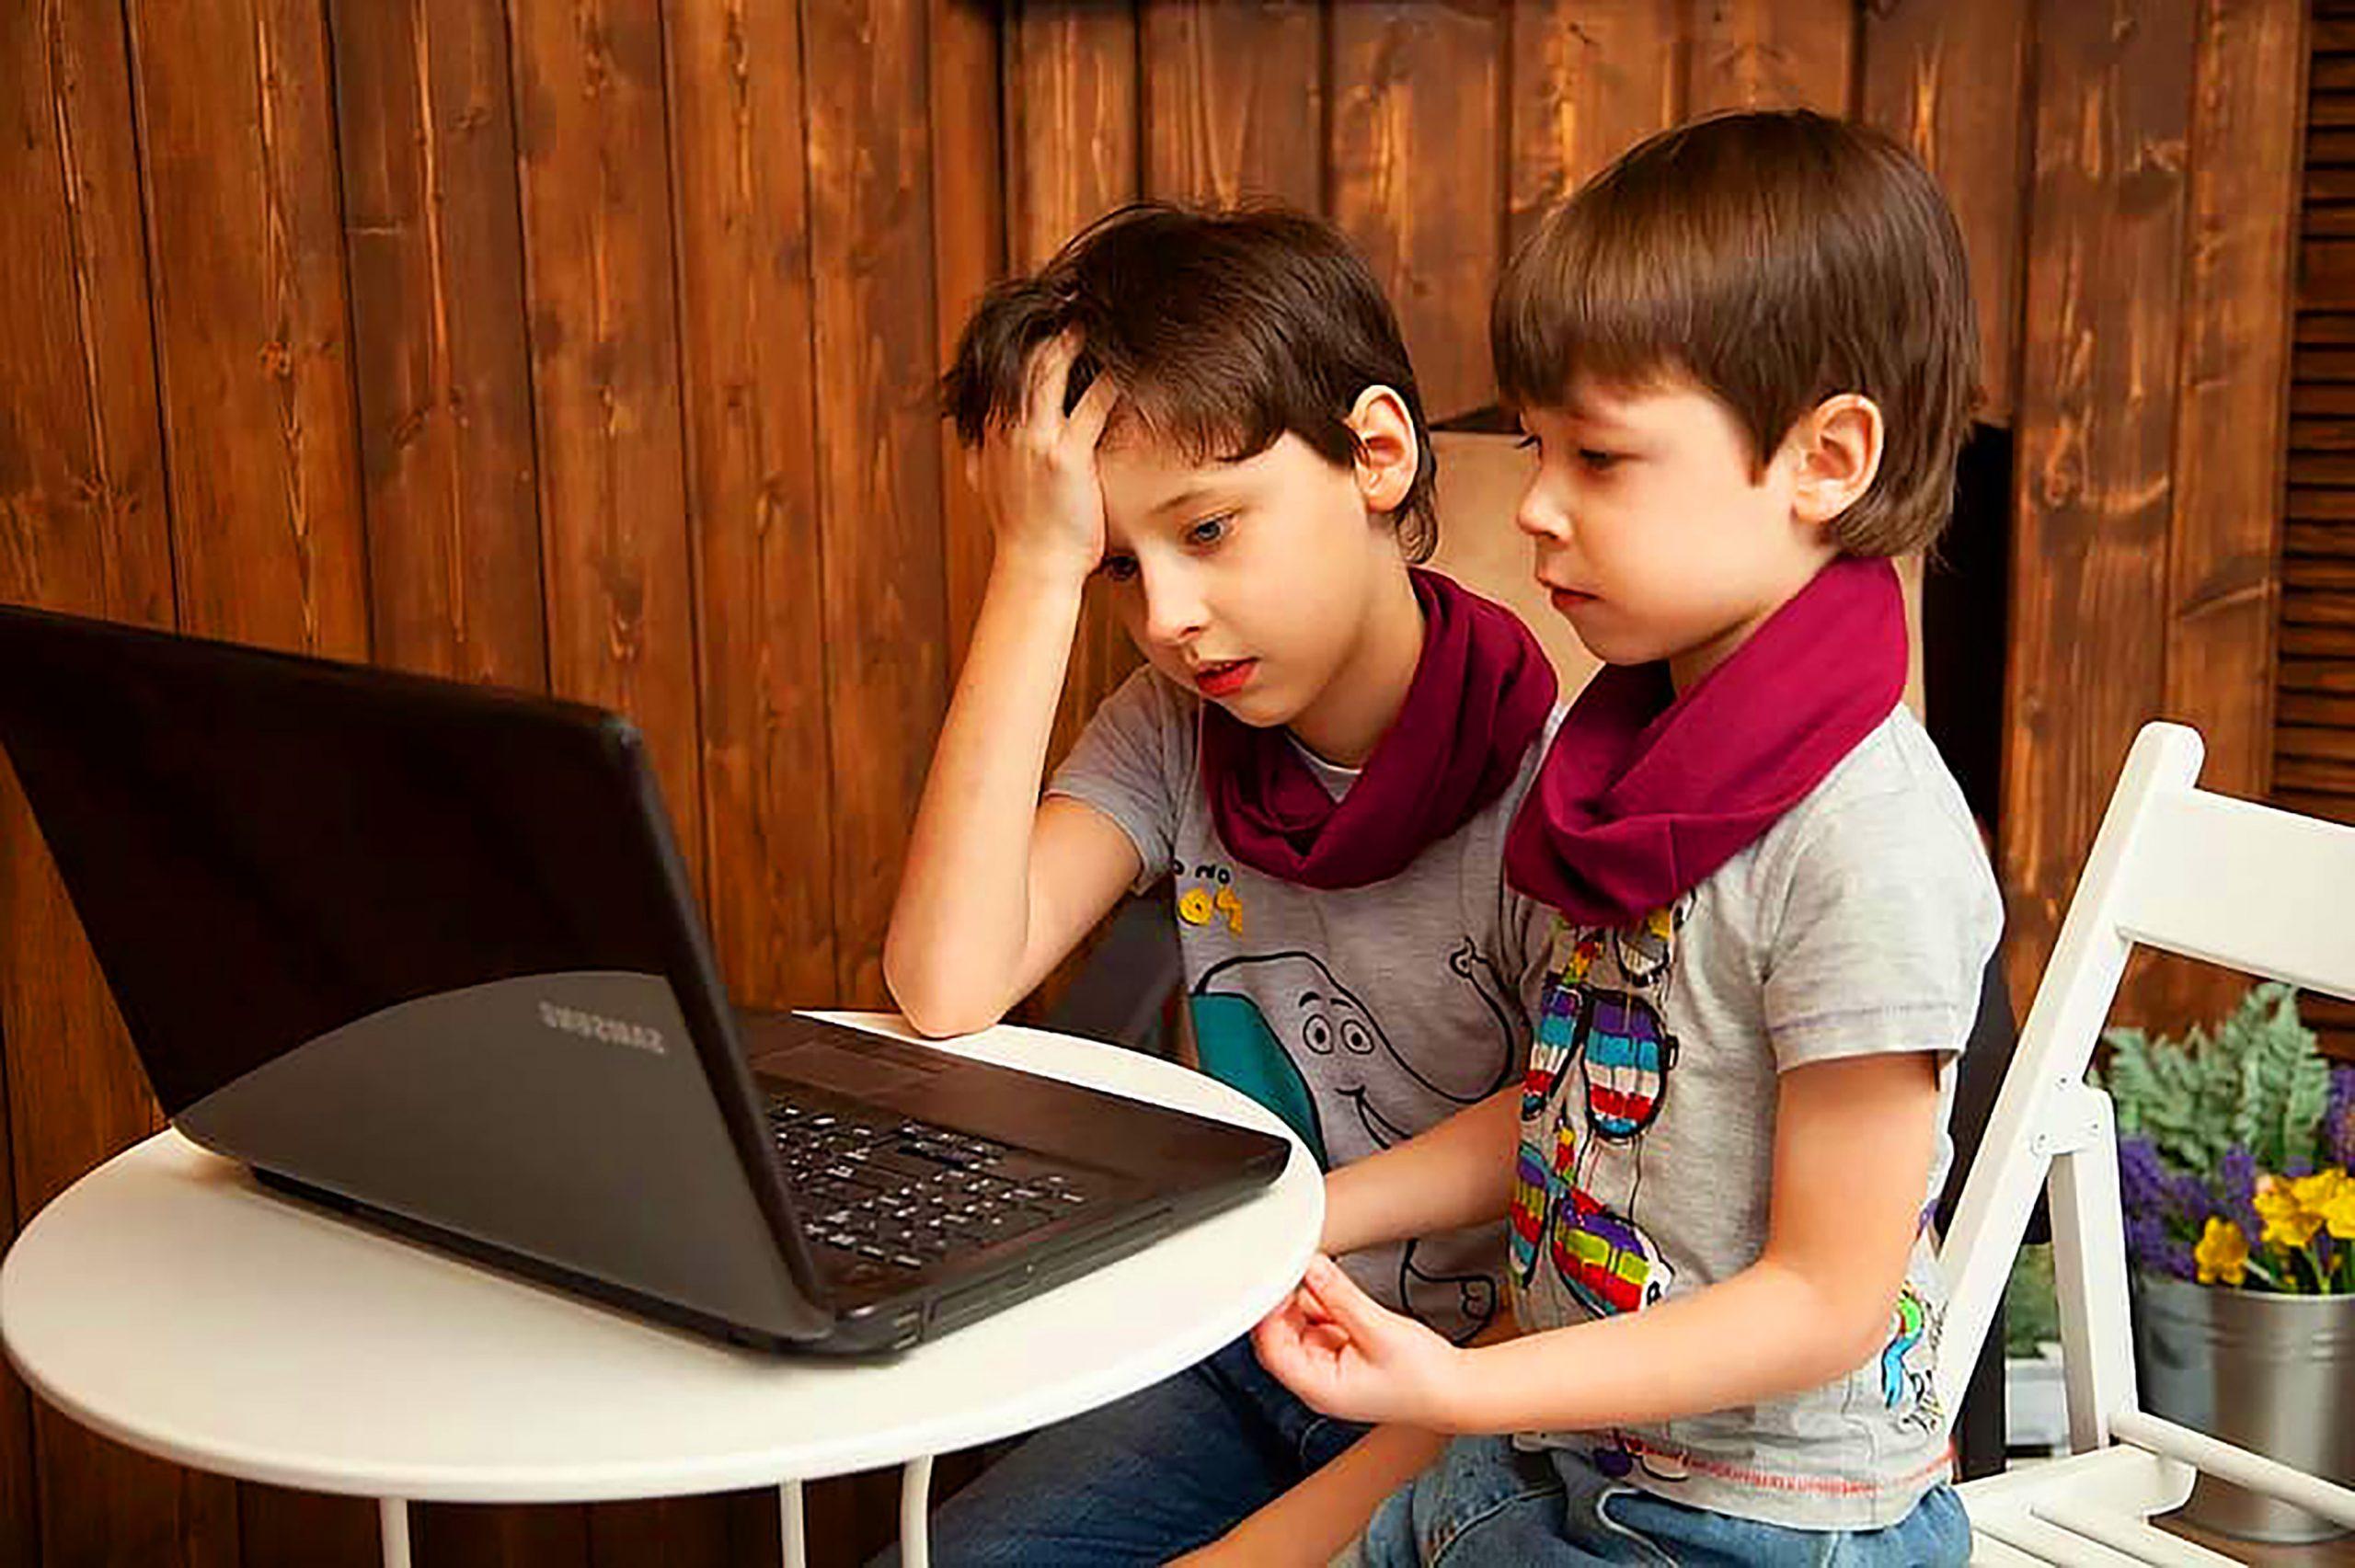 boys on computer3